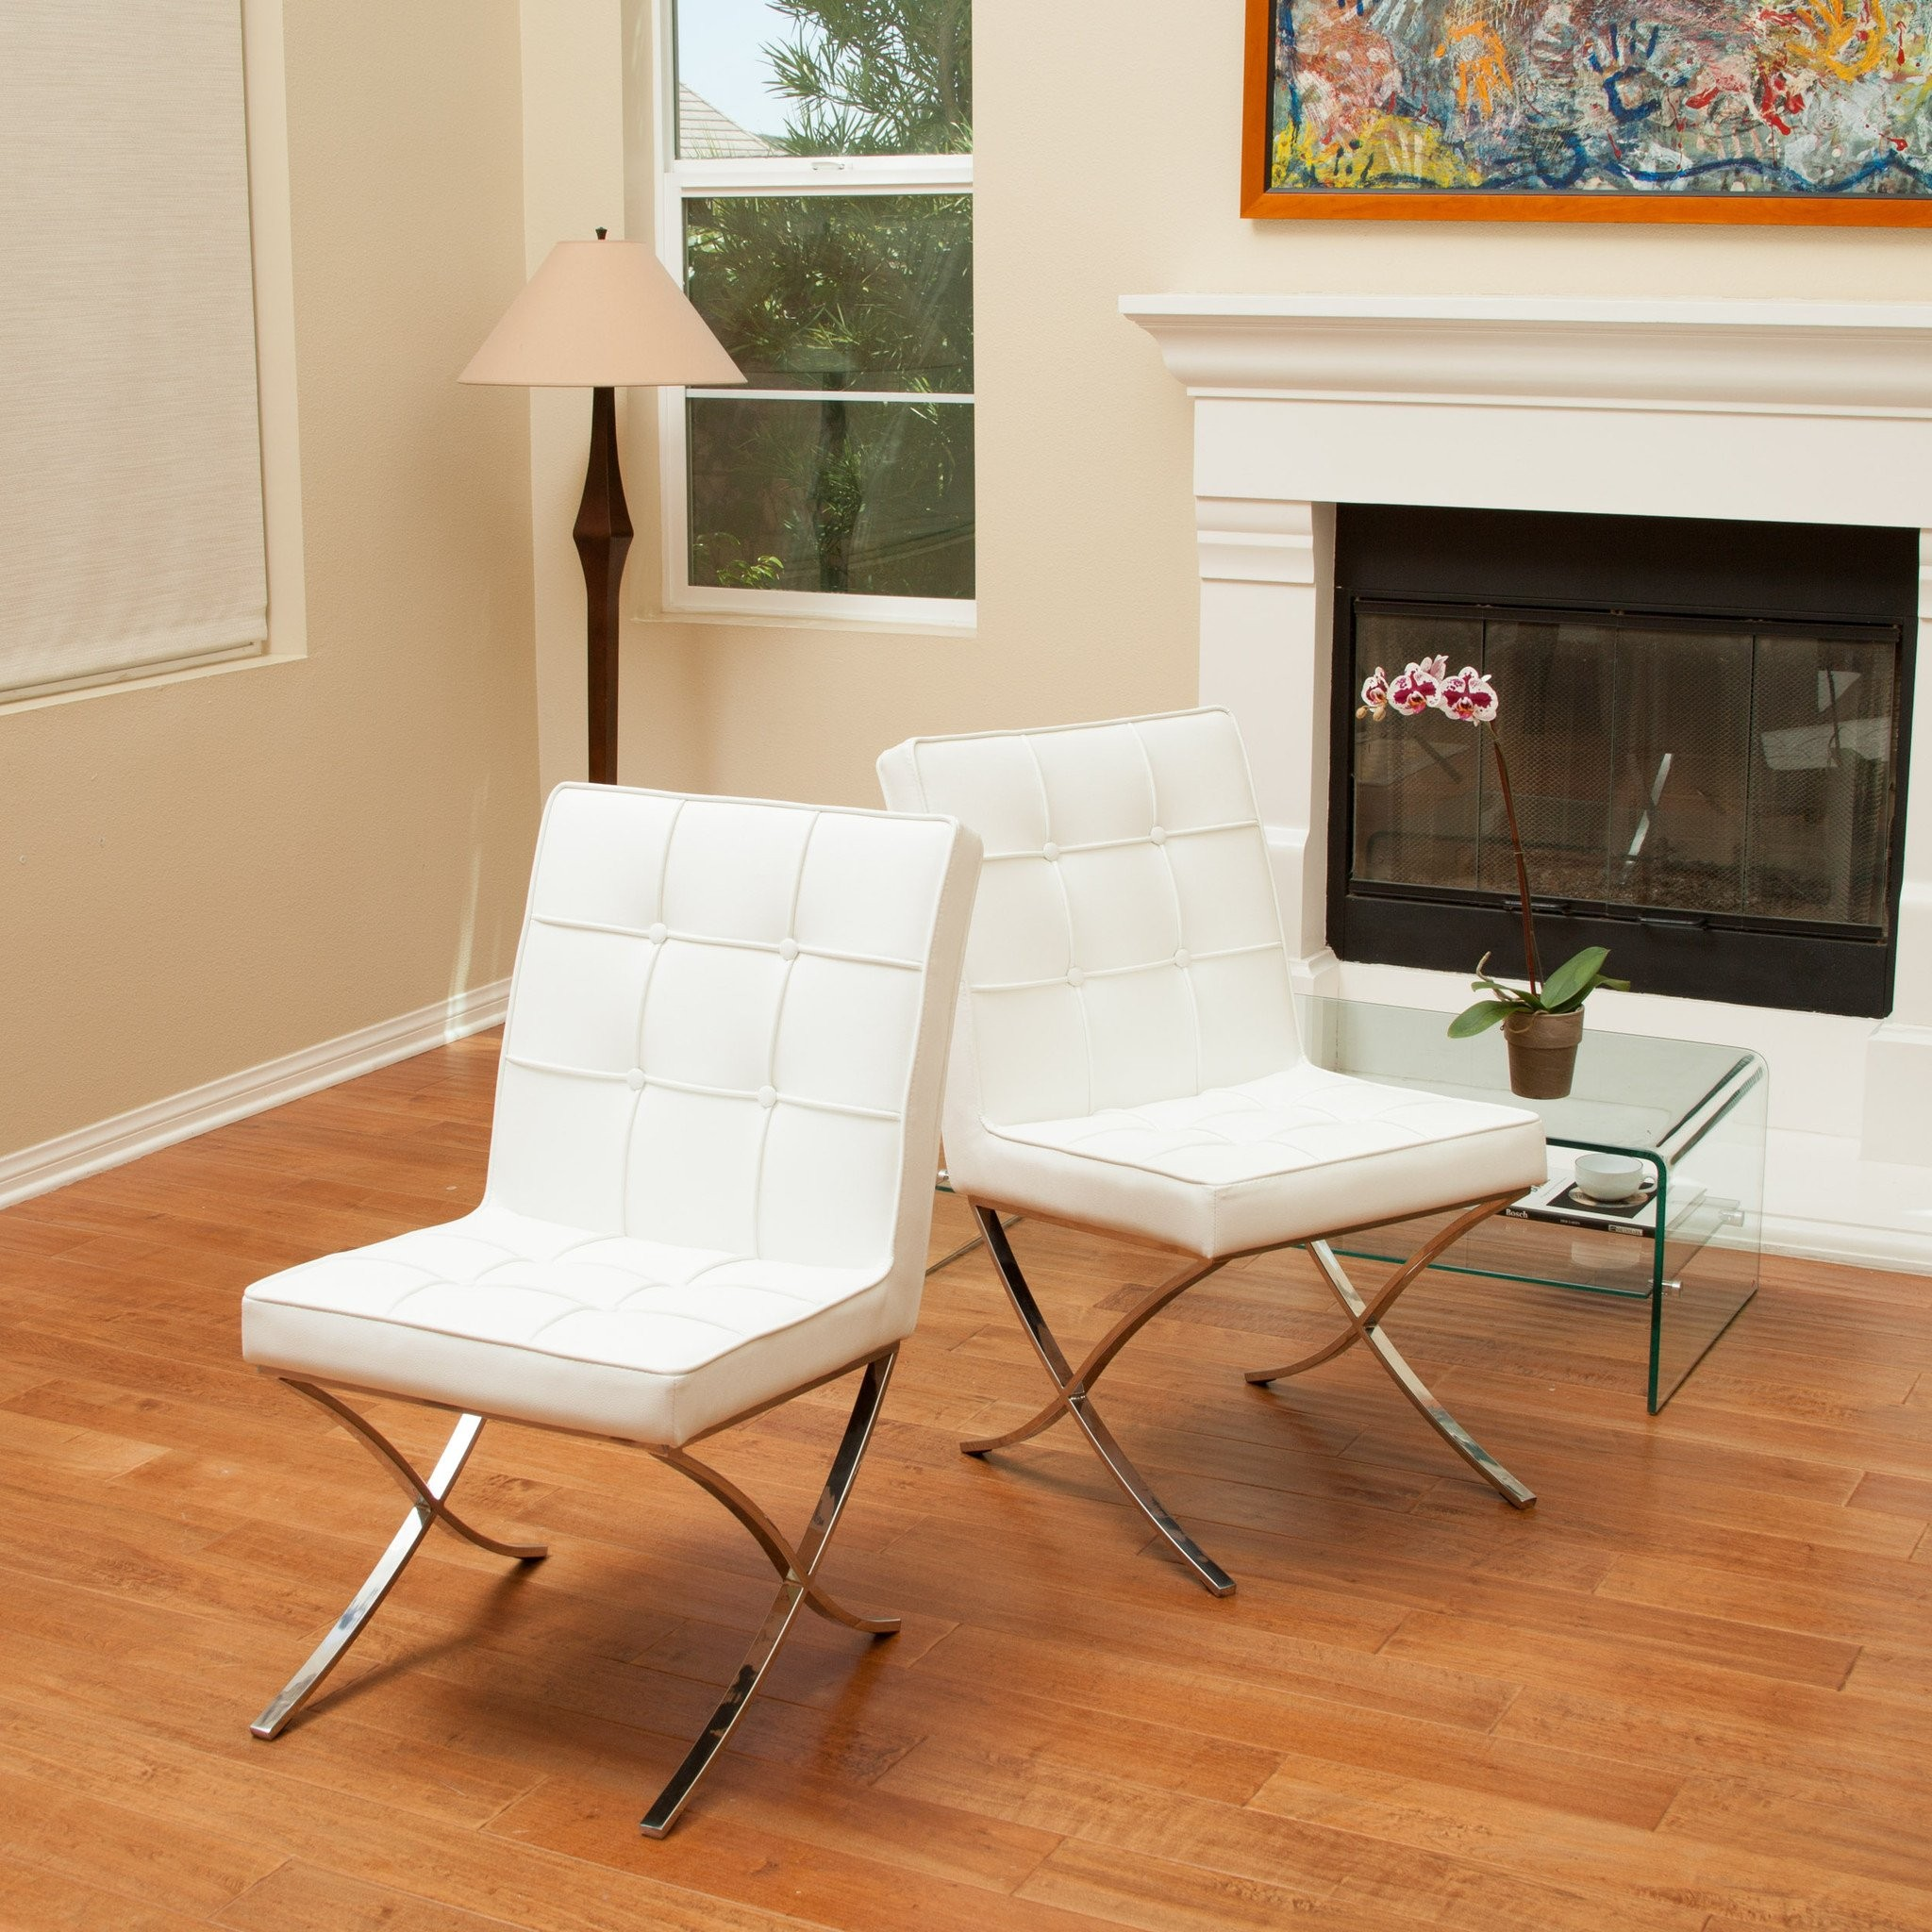 Pandora Modern Design White Leather Dining Chairs...